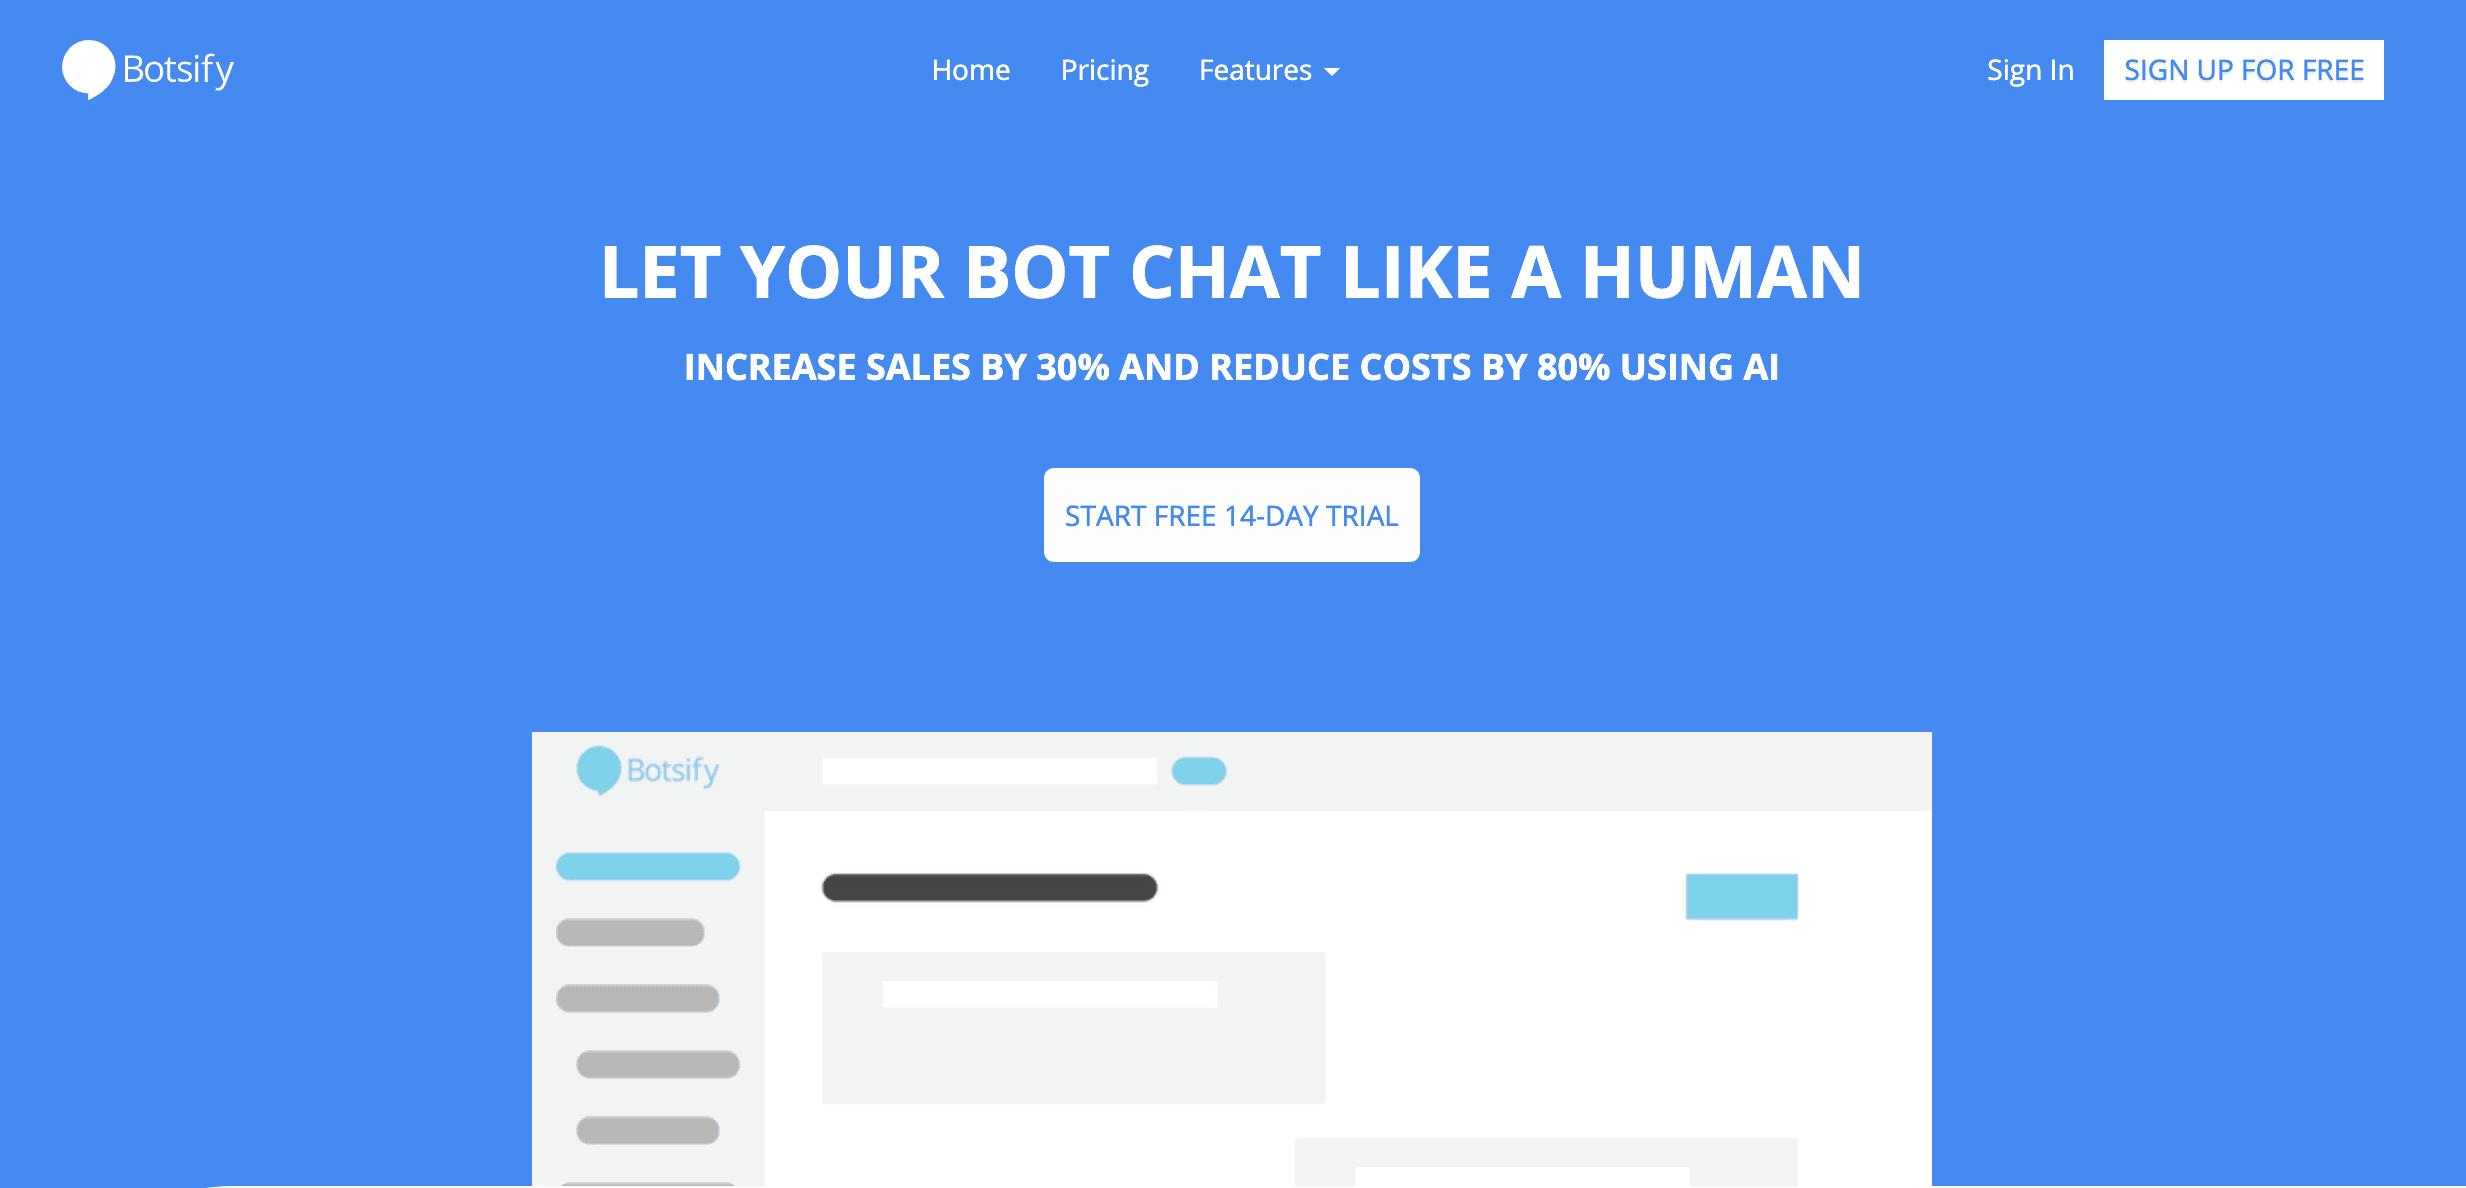 The Botsify homepage.